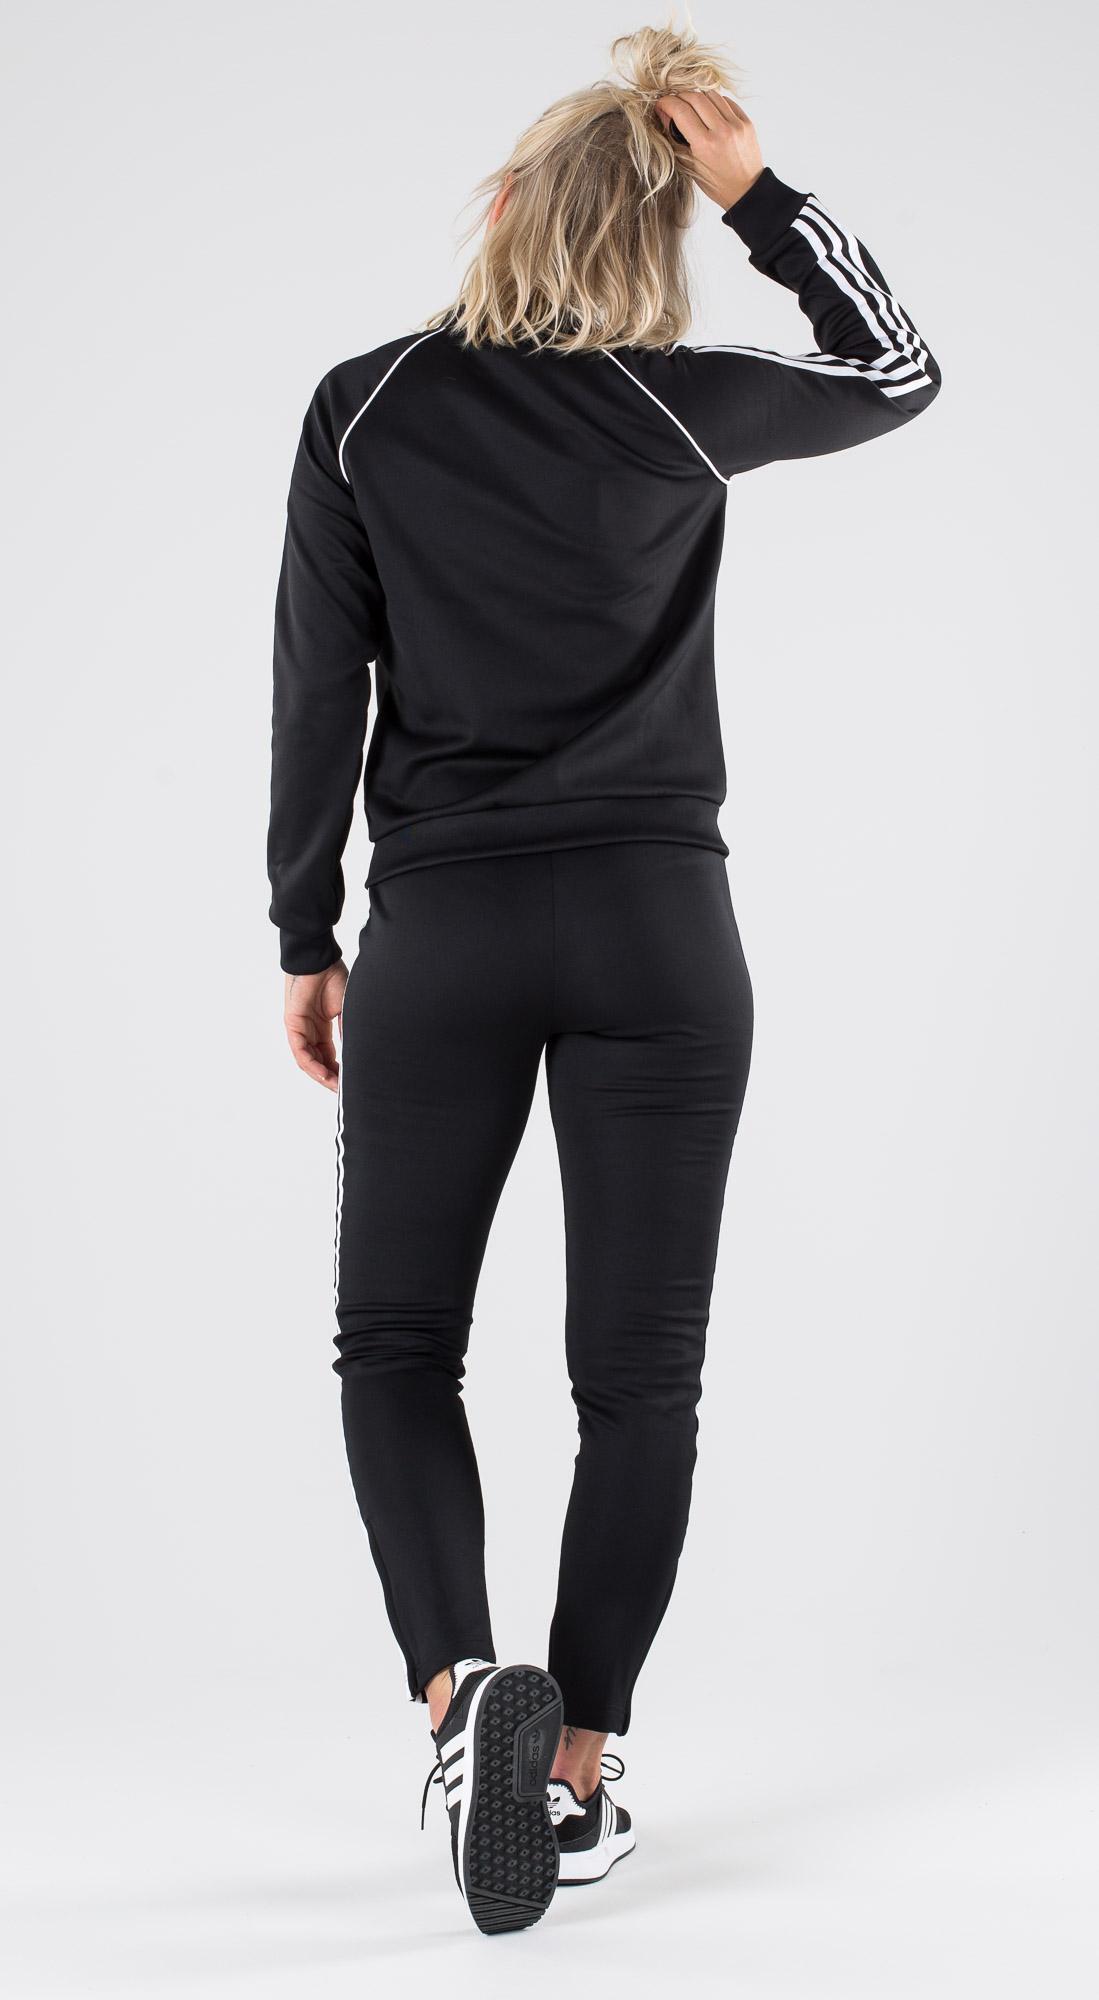 Adidas Originals Sst Tt Black Outfit Ridestore